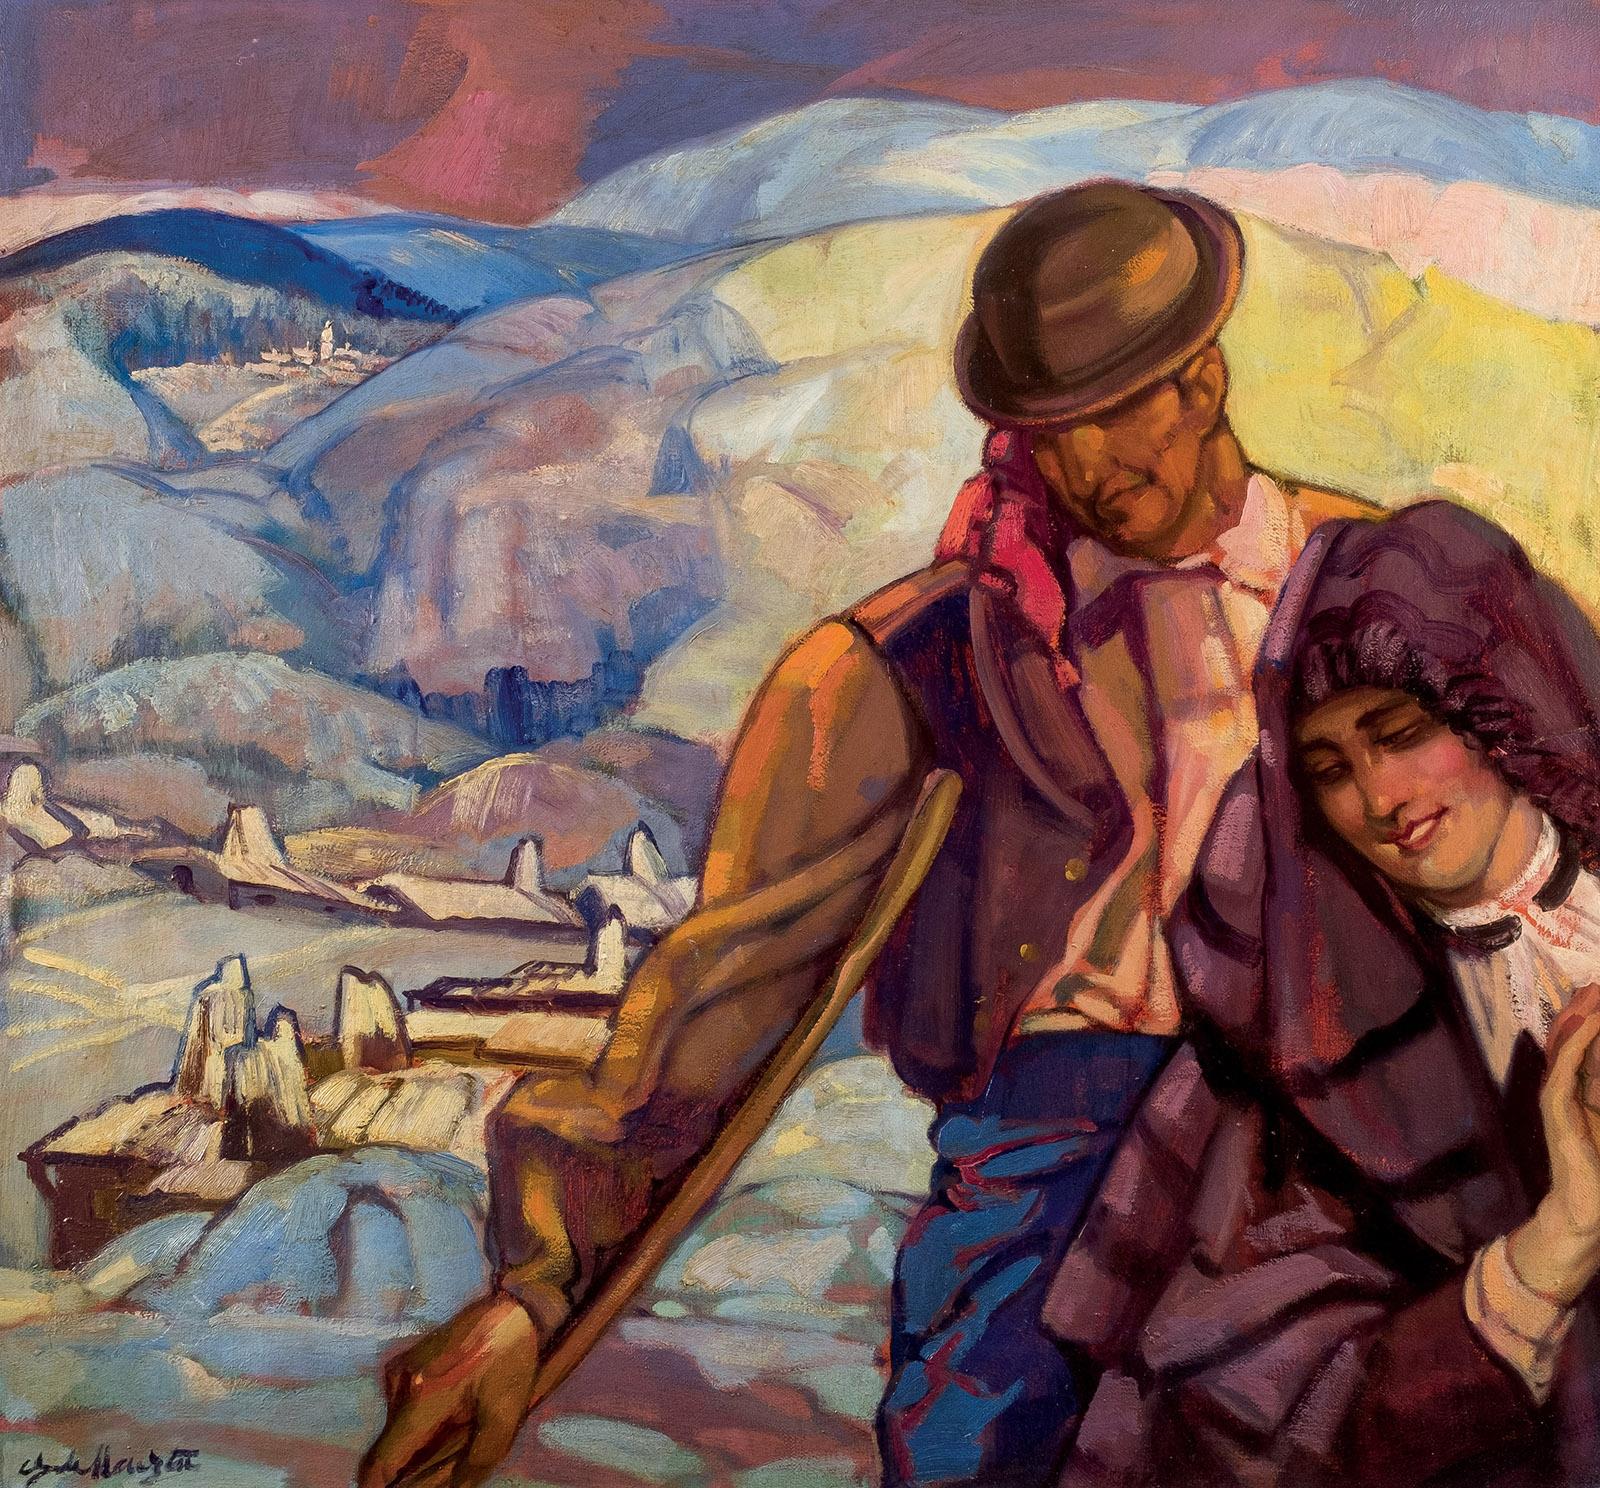 Gustavo de Maeztu. Idilio salacenco, c. 1935/45. Salida y remate: 6.000 euros